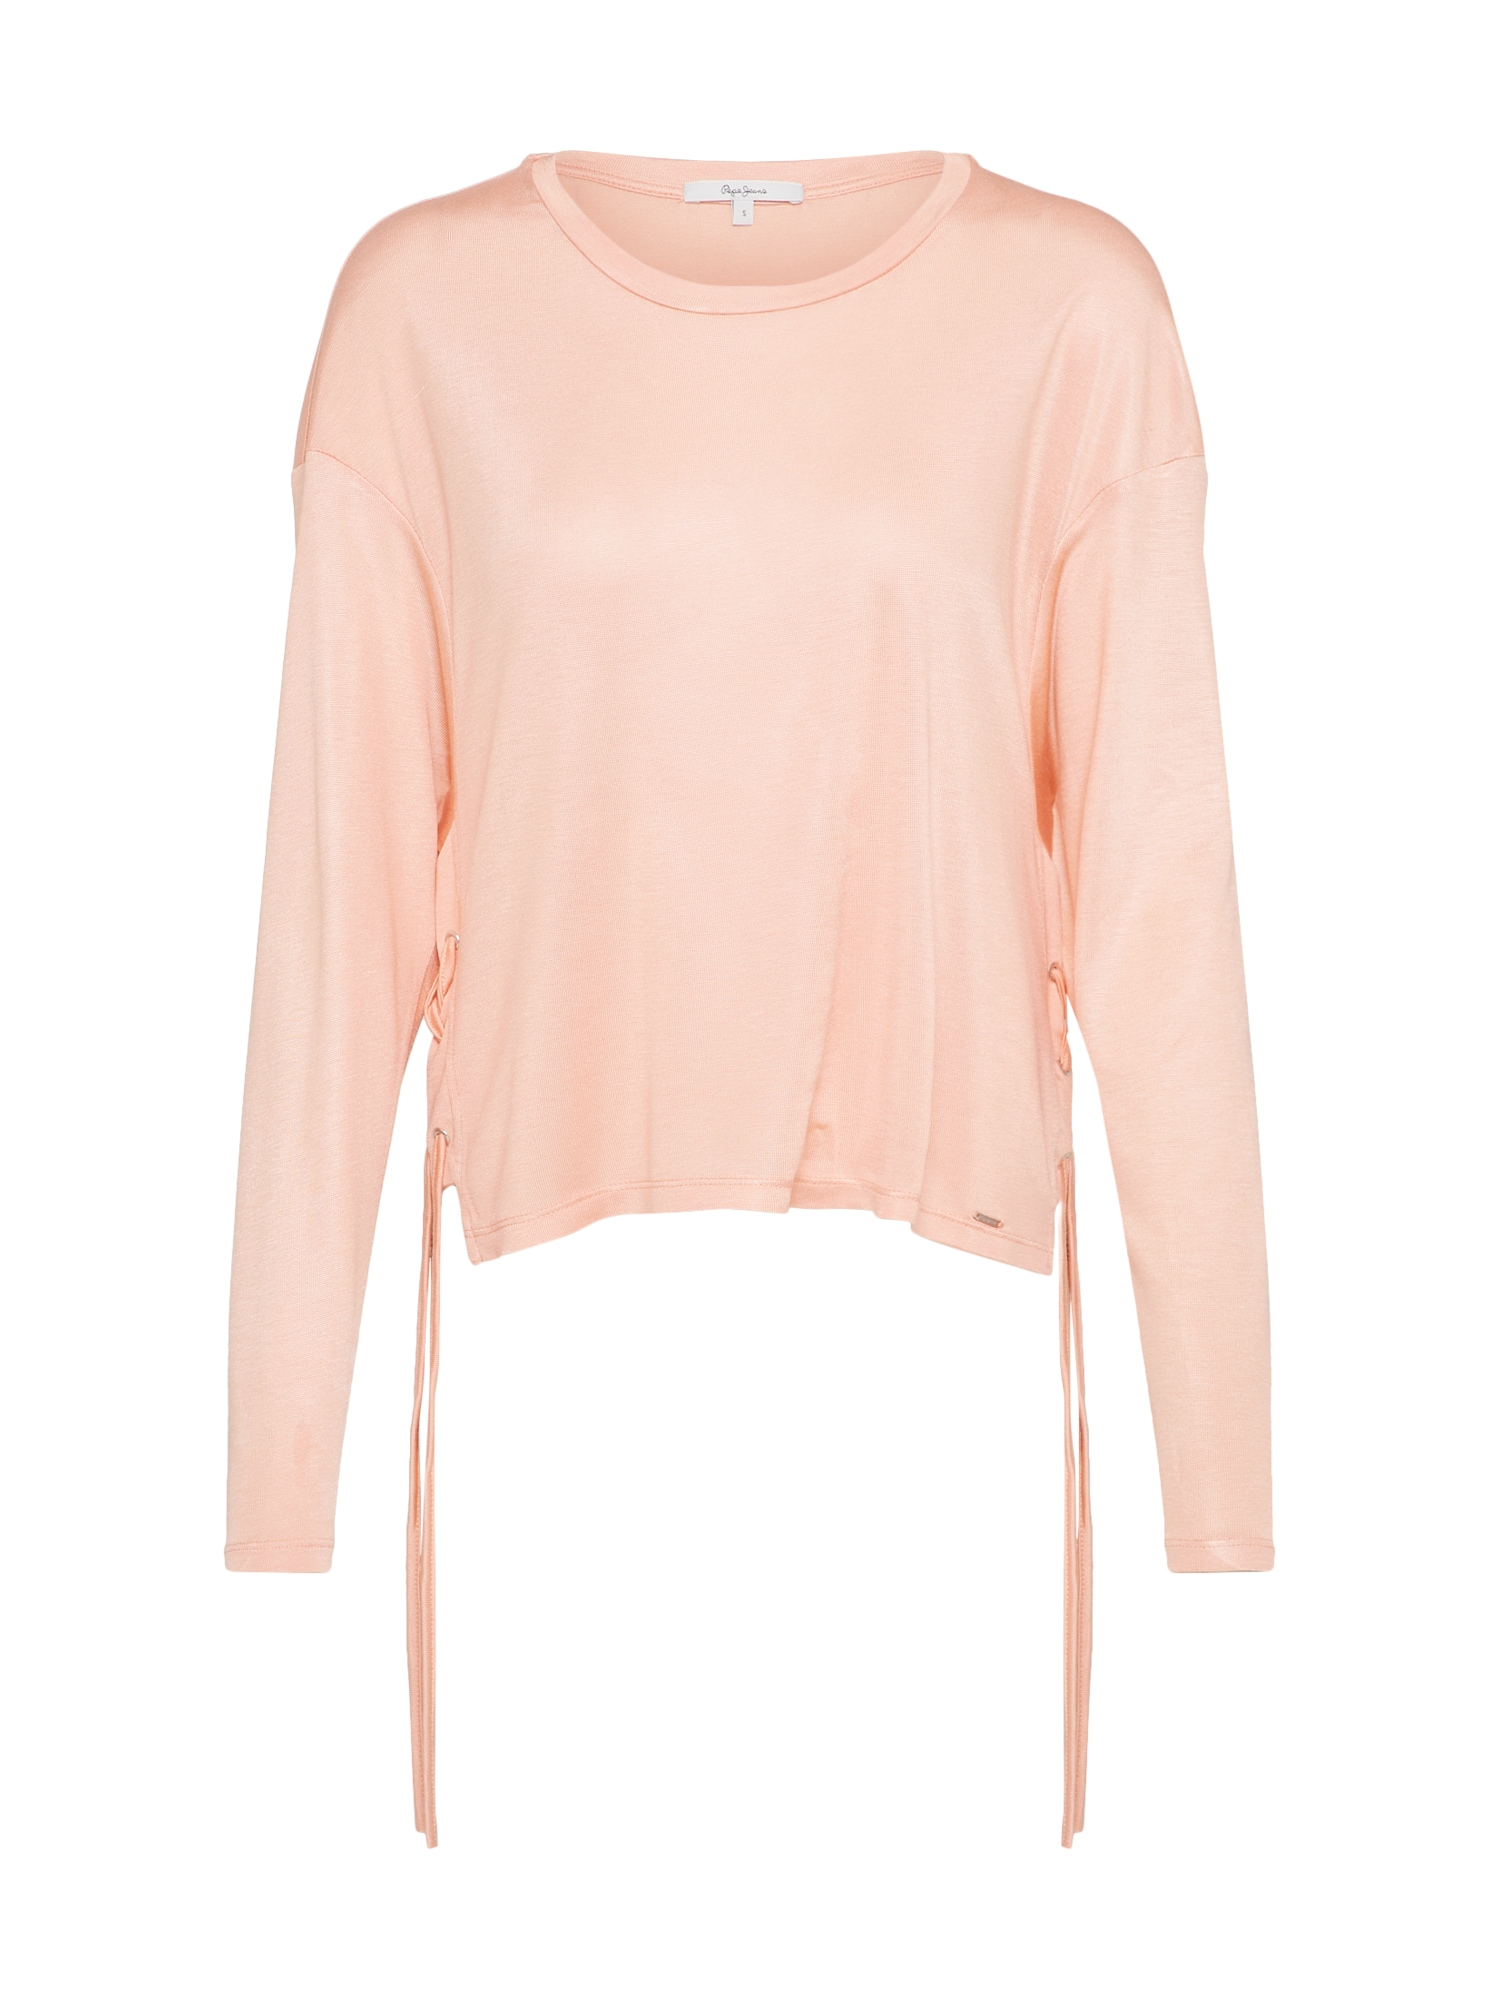 Pepe Jeans Dames Shirt DAKOTAS rosa